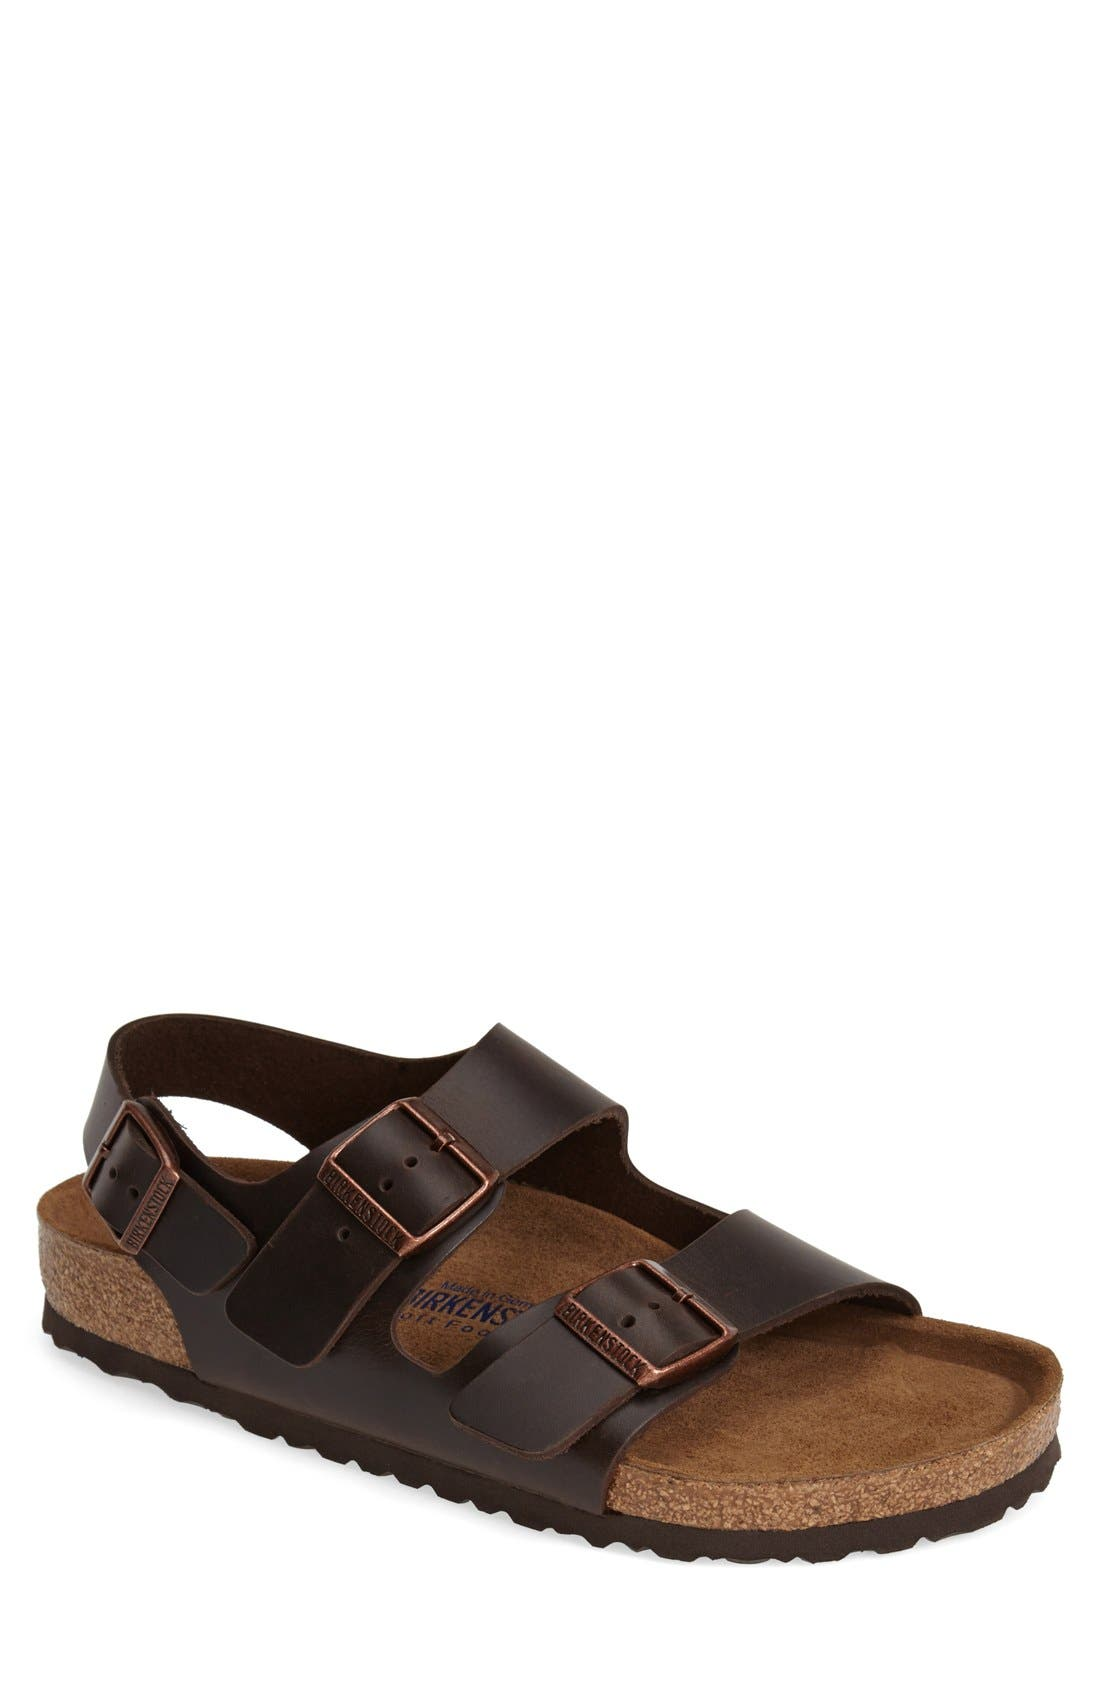 'Milano' Soft Footbed Sandal,                         Main,                         color, AMALFI BROWN